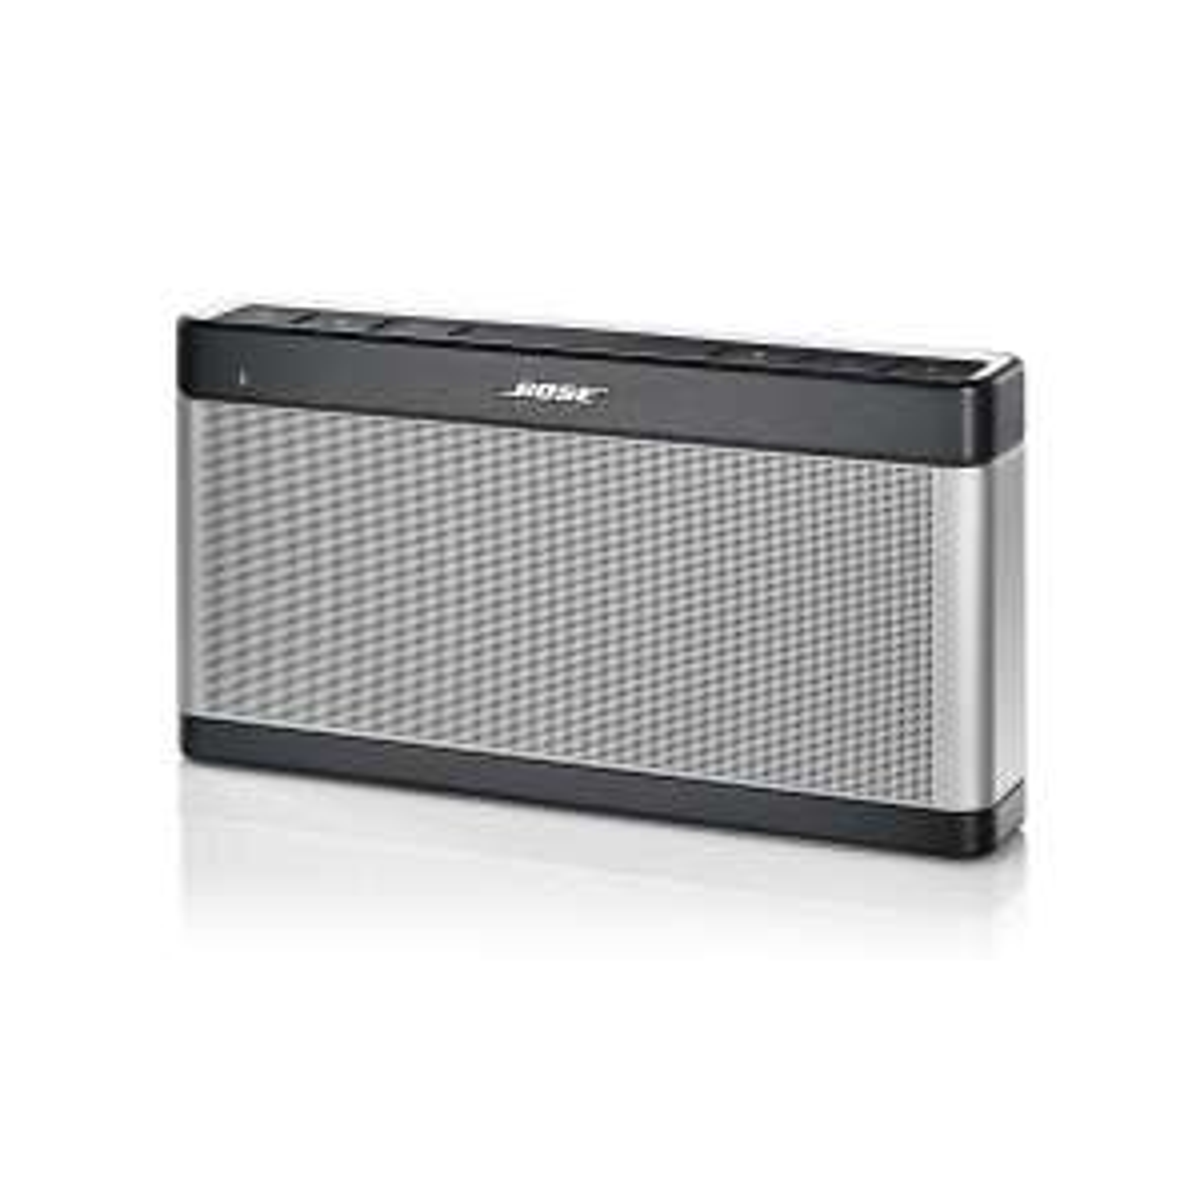 Enceinte bluetooth Bose SoundLink III - argent